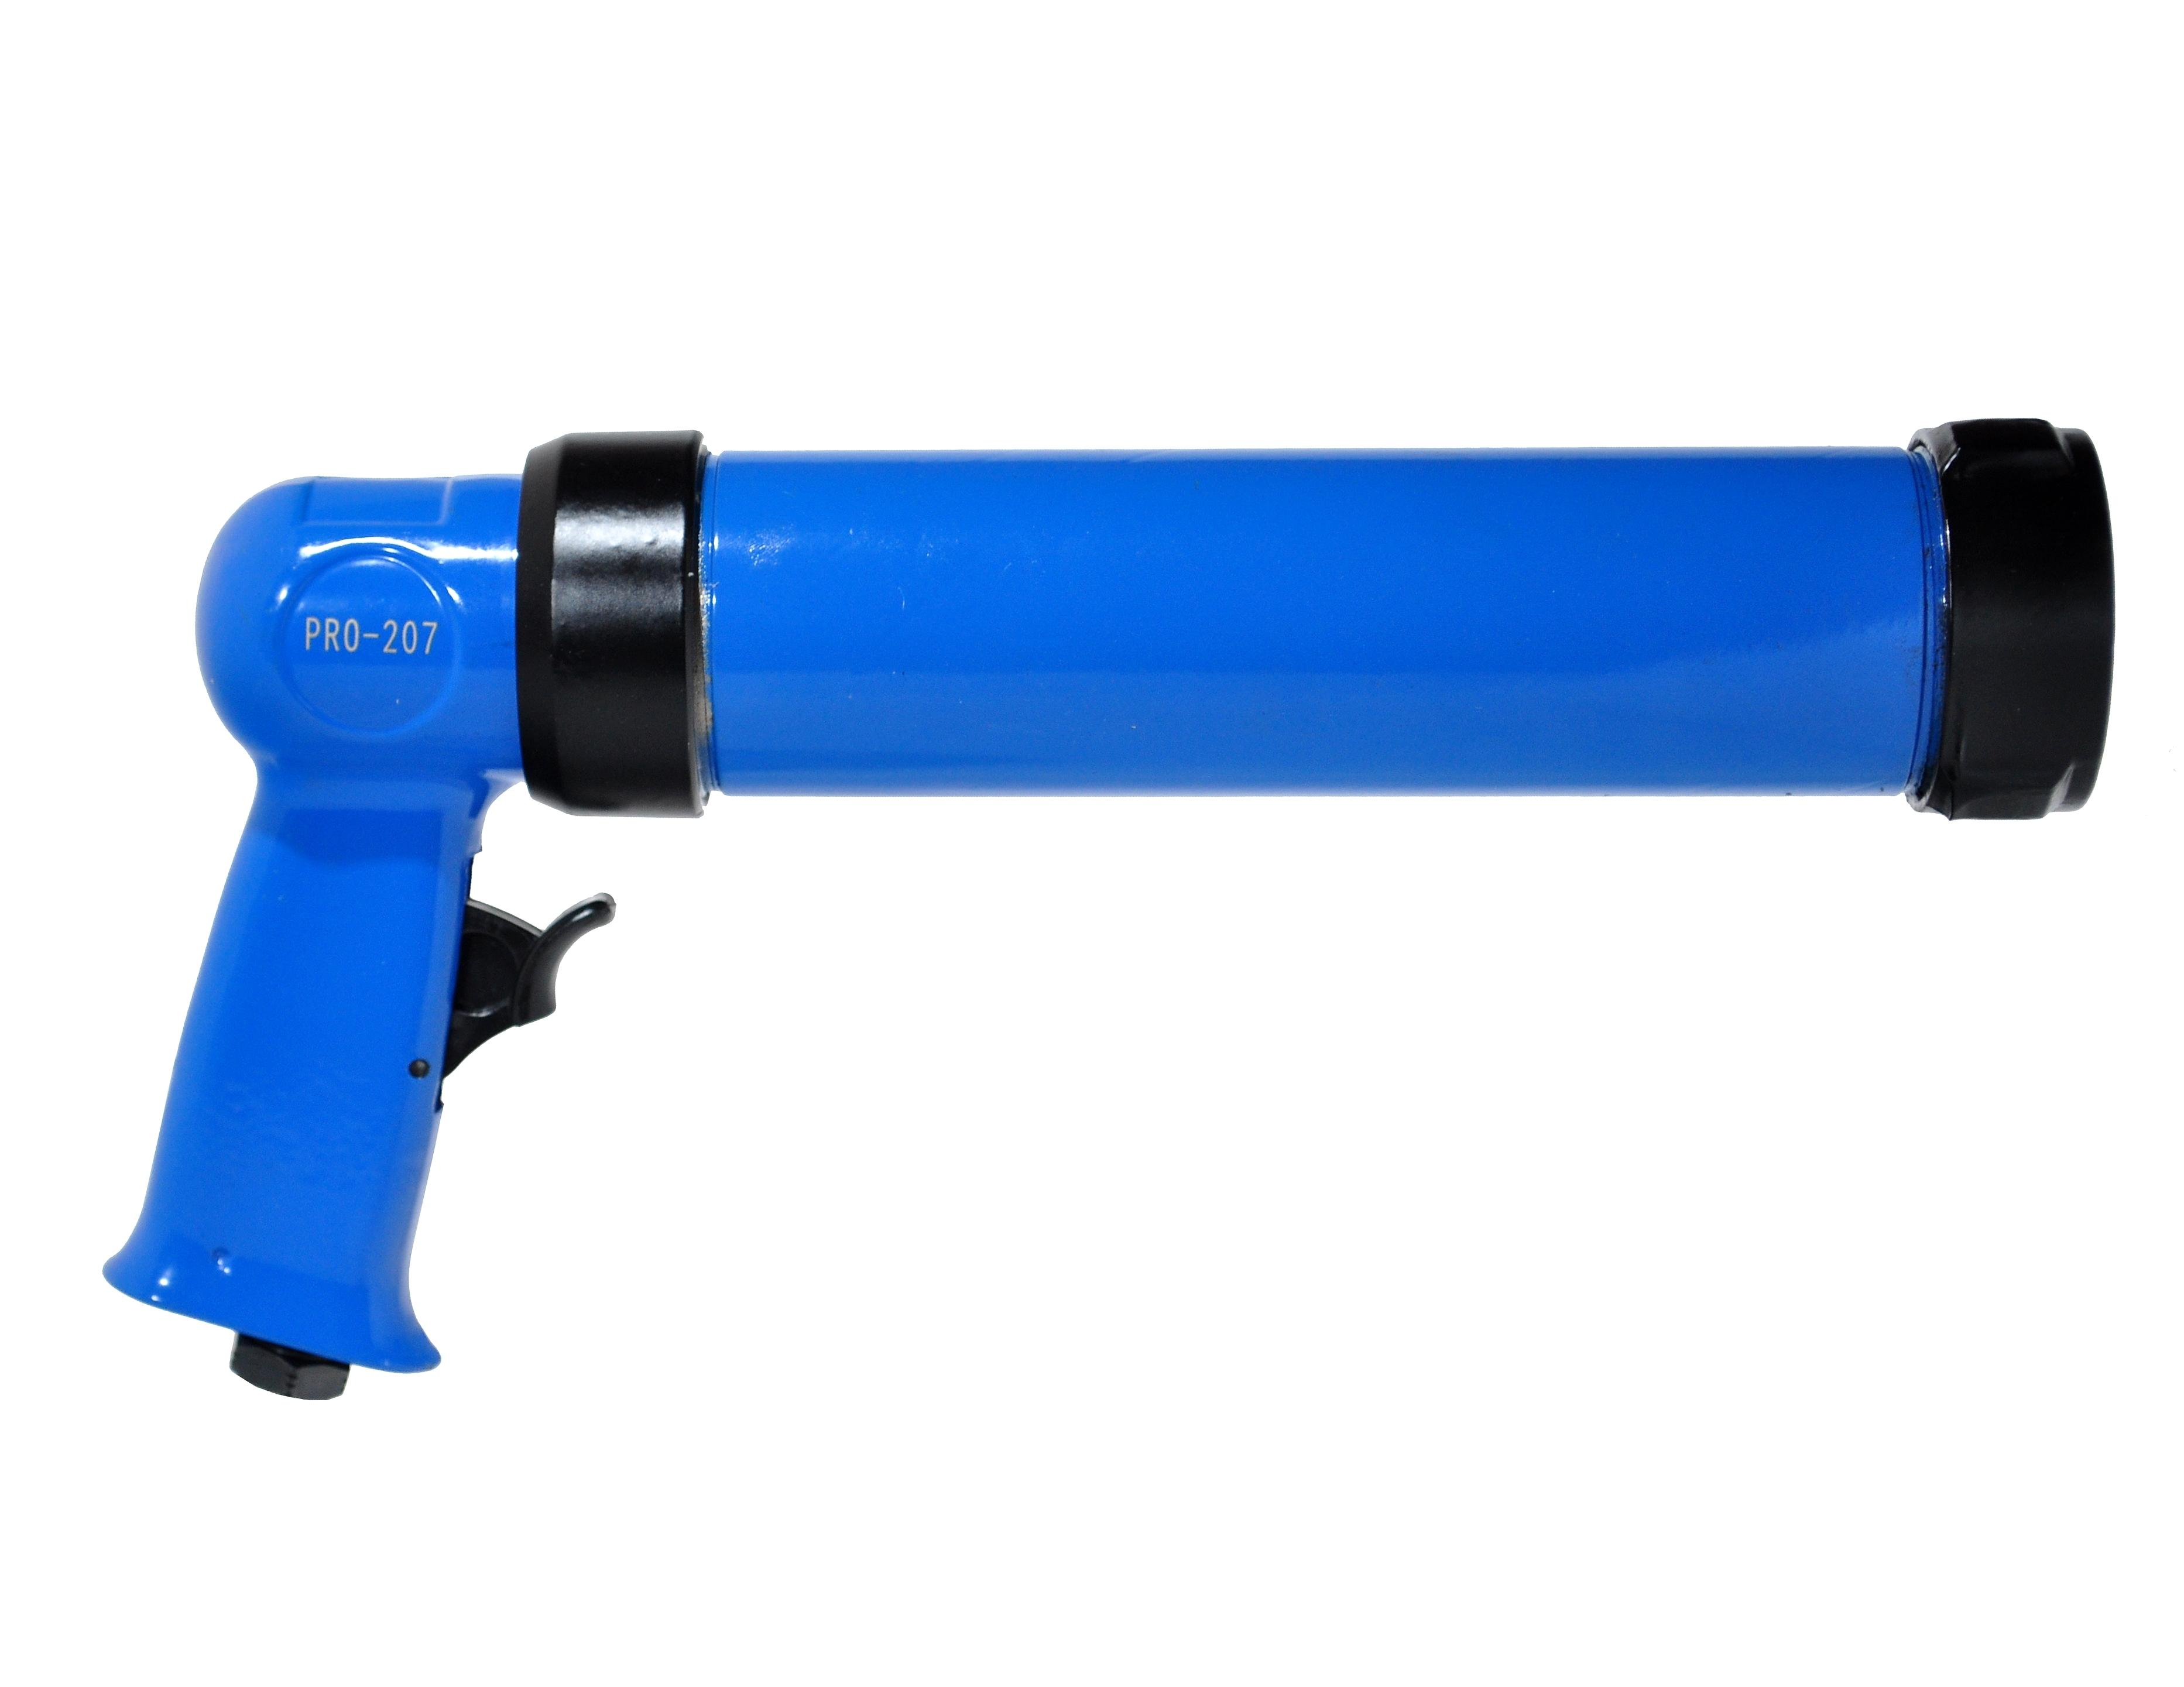 Aplicador de Silicone - PRO-207